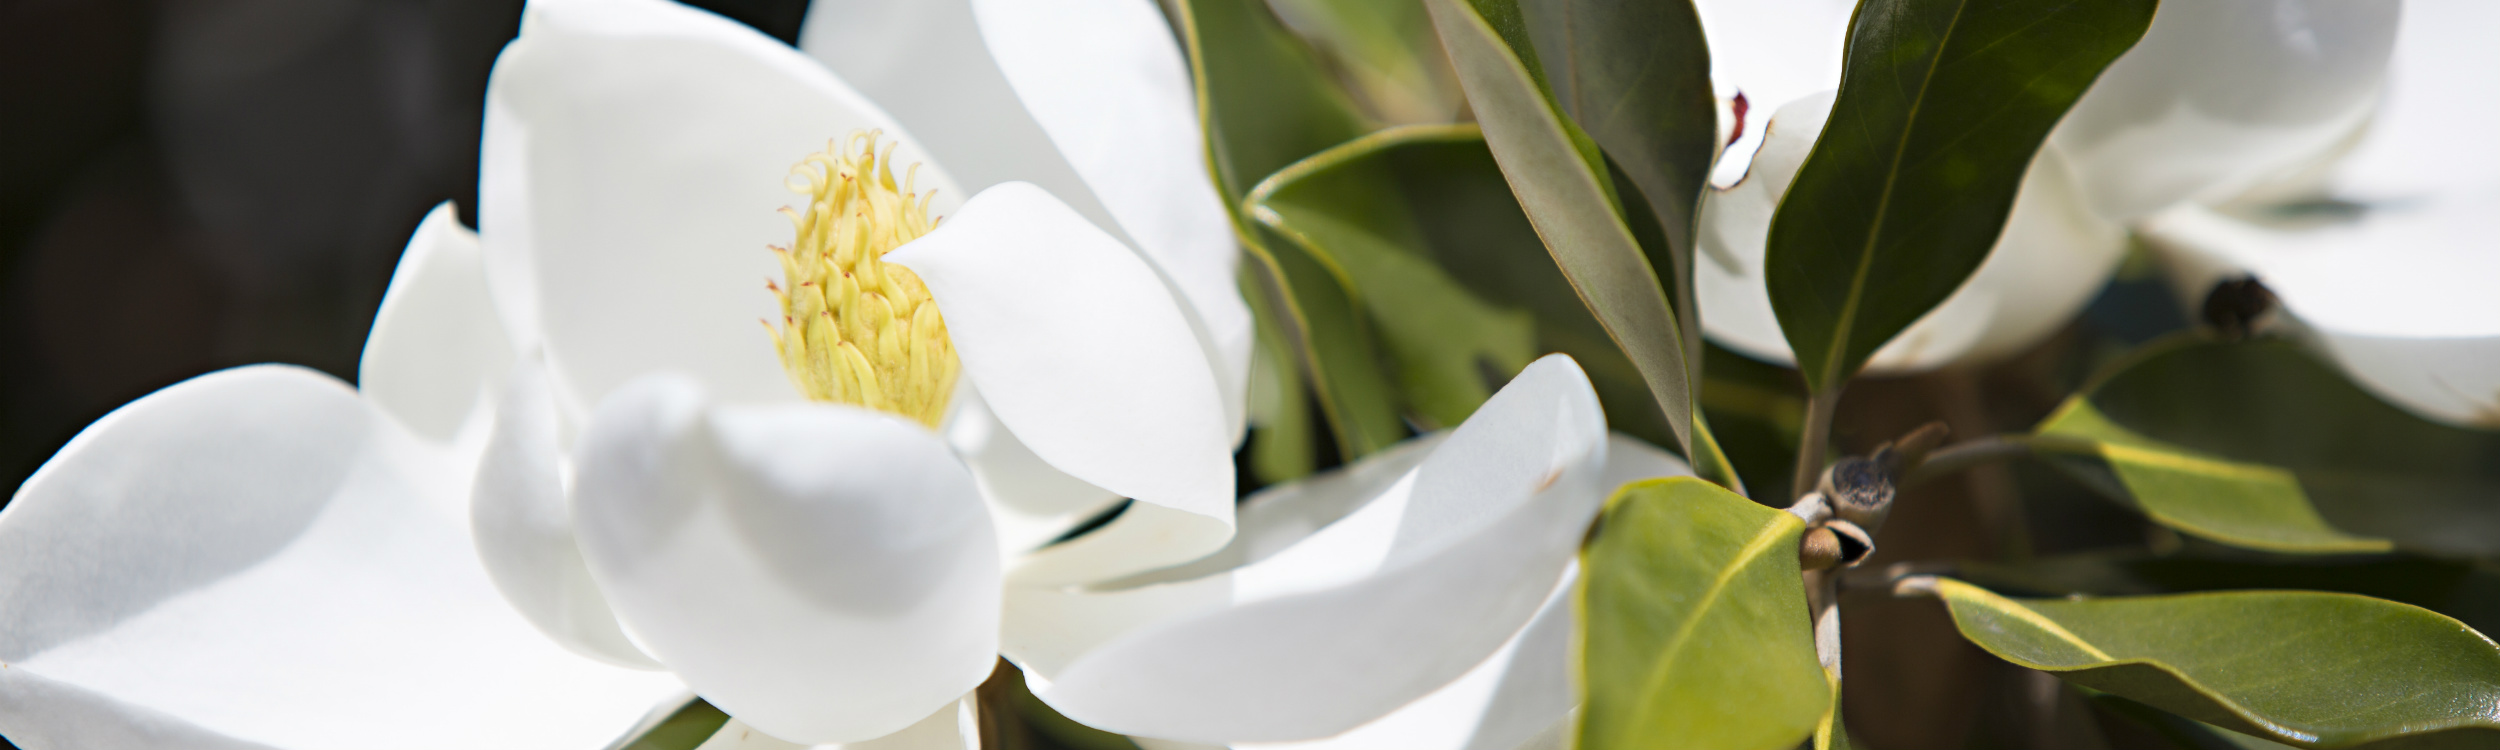 Arborwest_flower